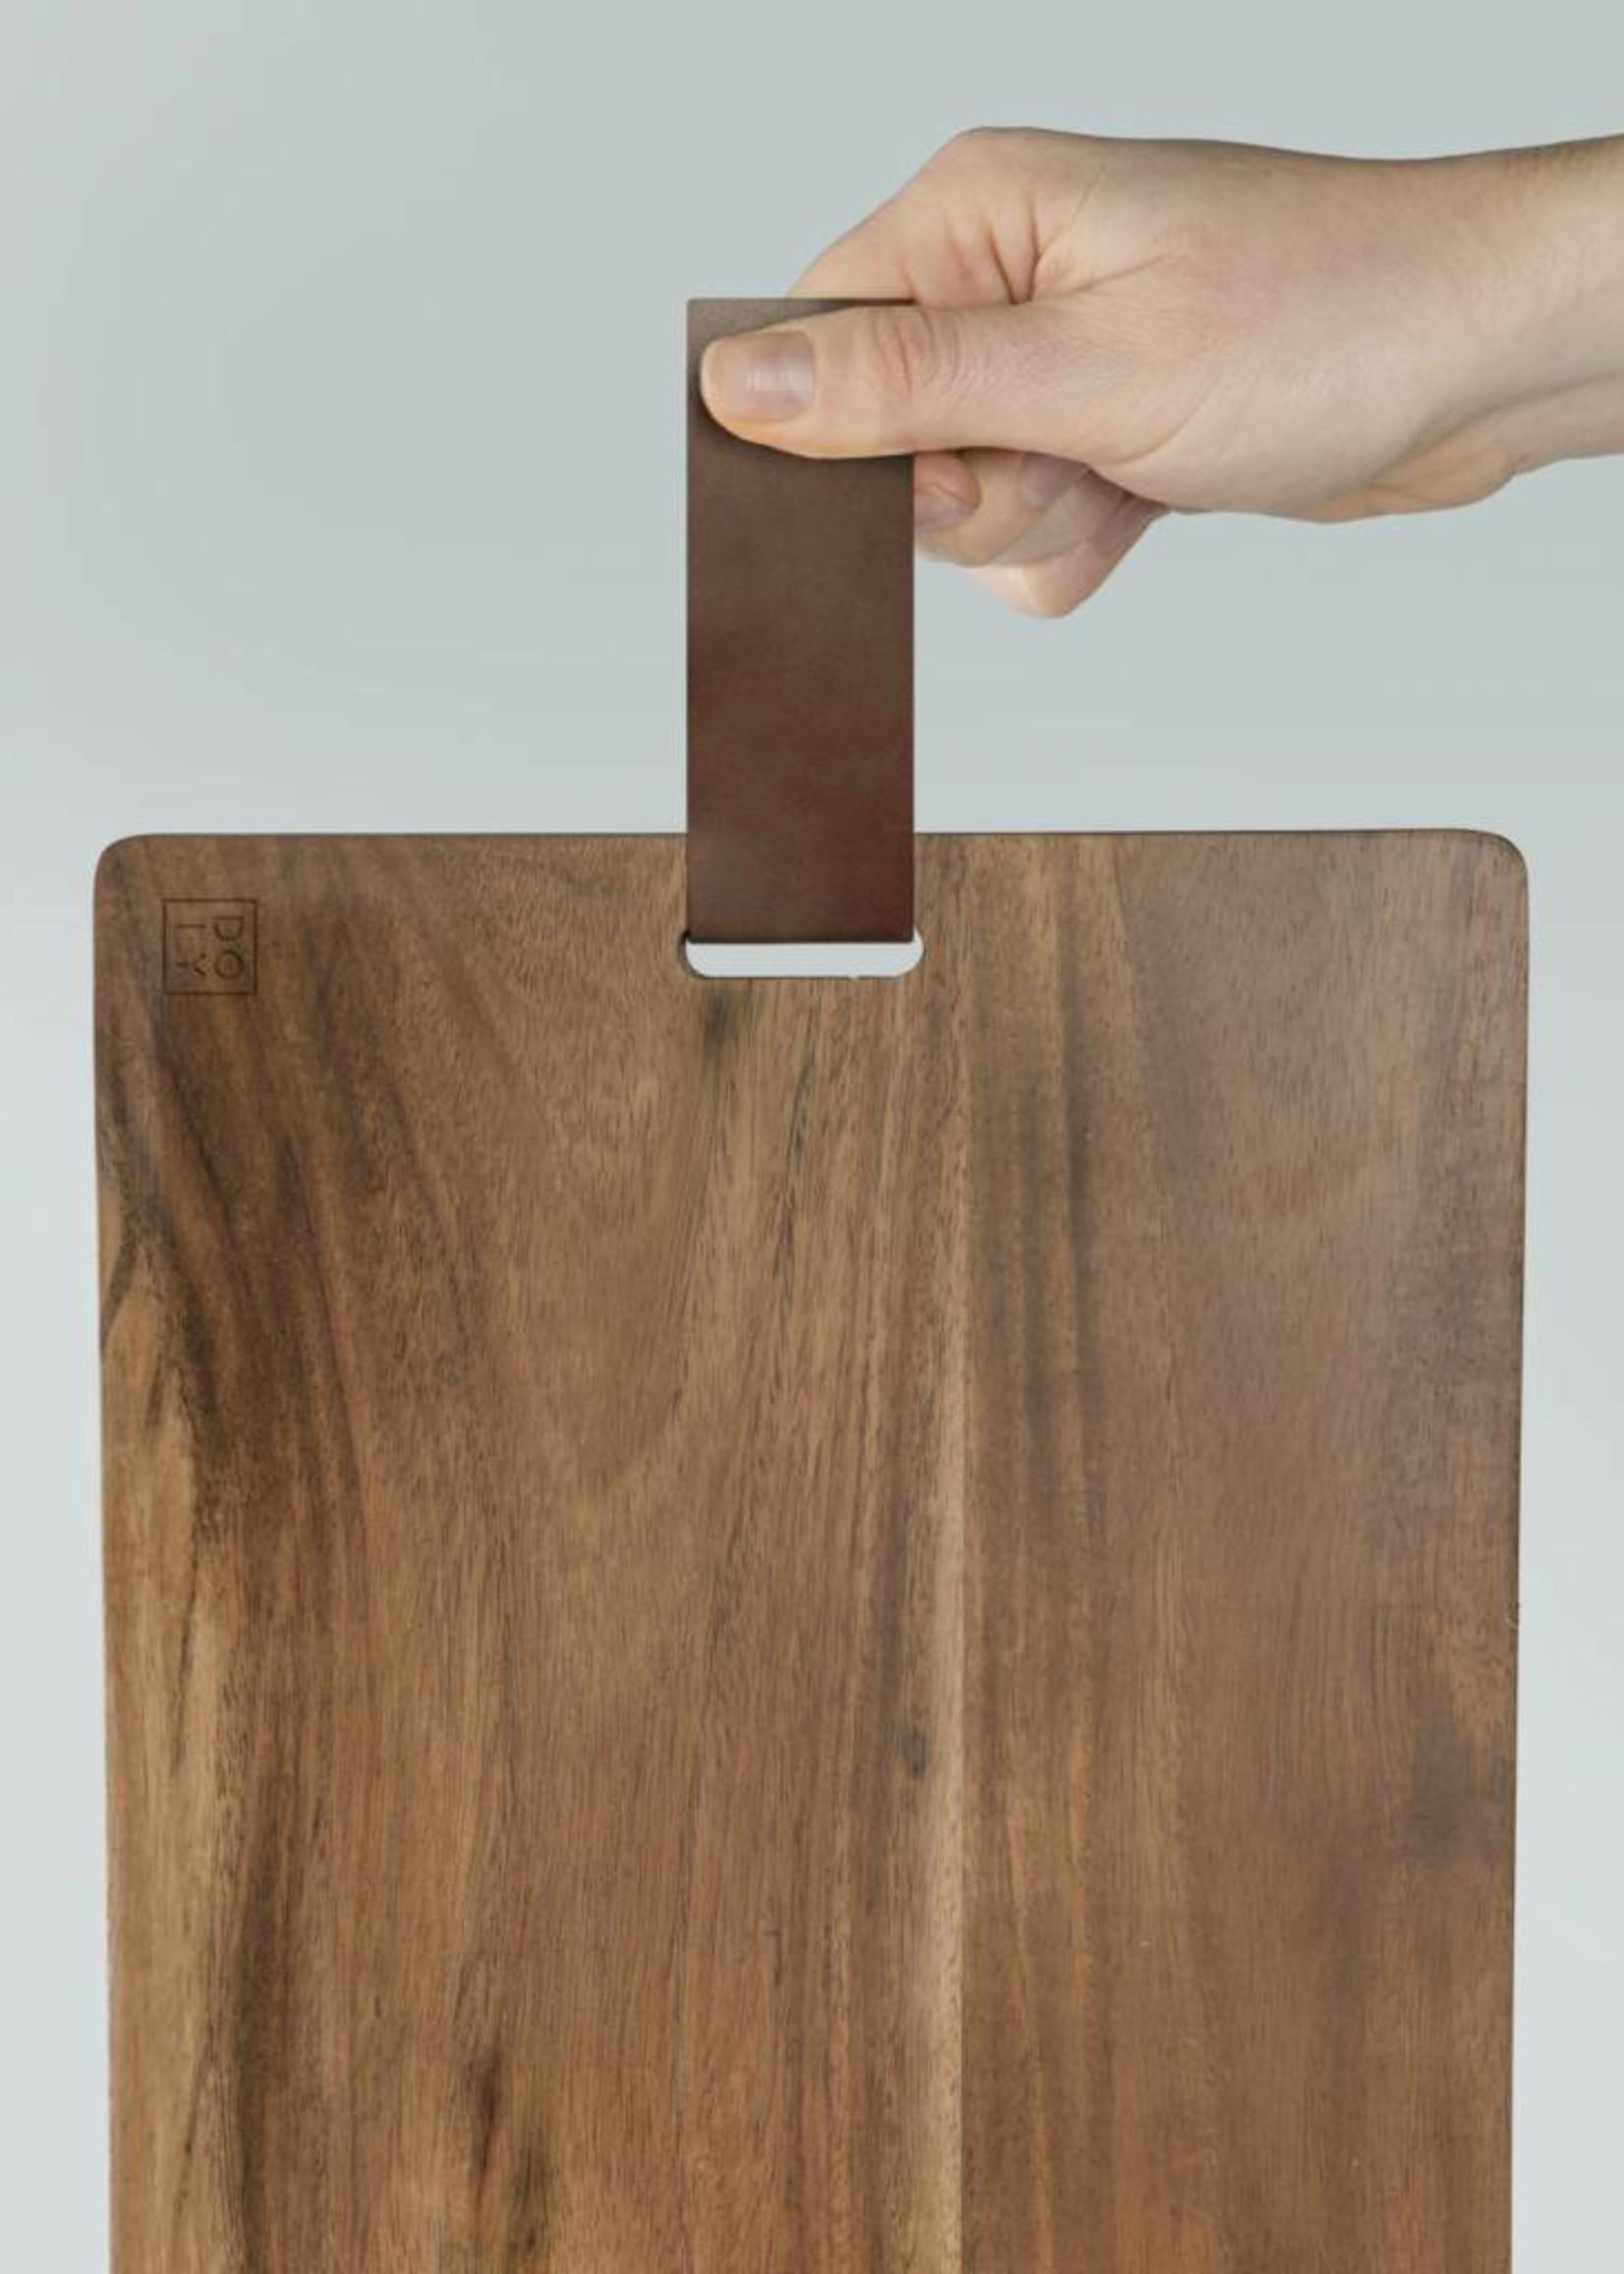 DOIY Cheeseporn Wooden cutting board